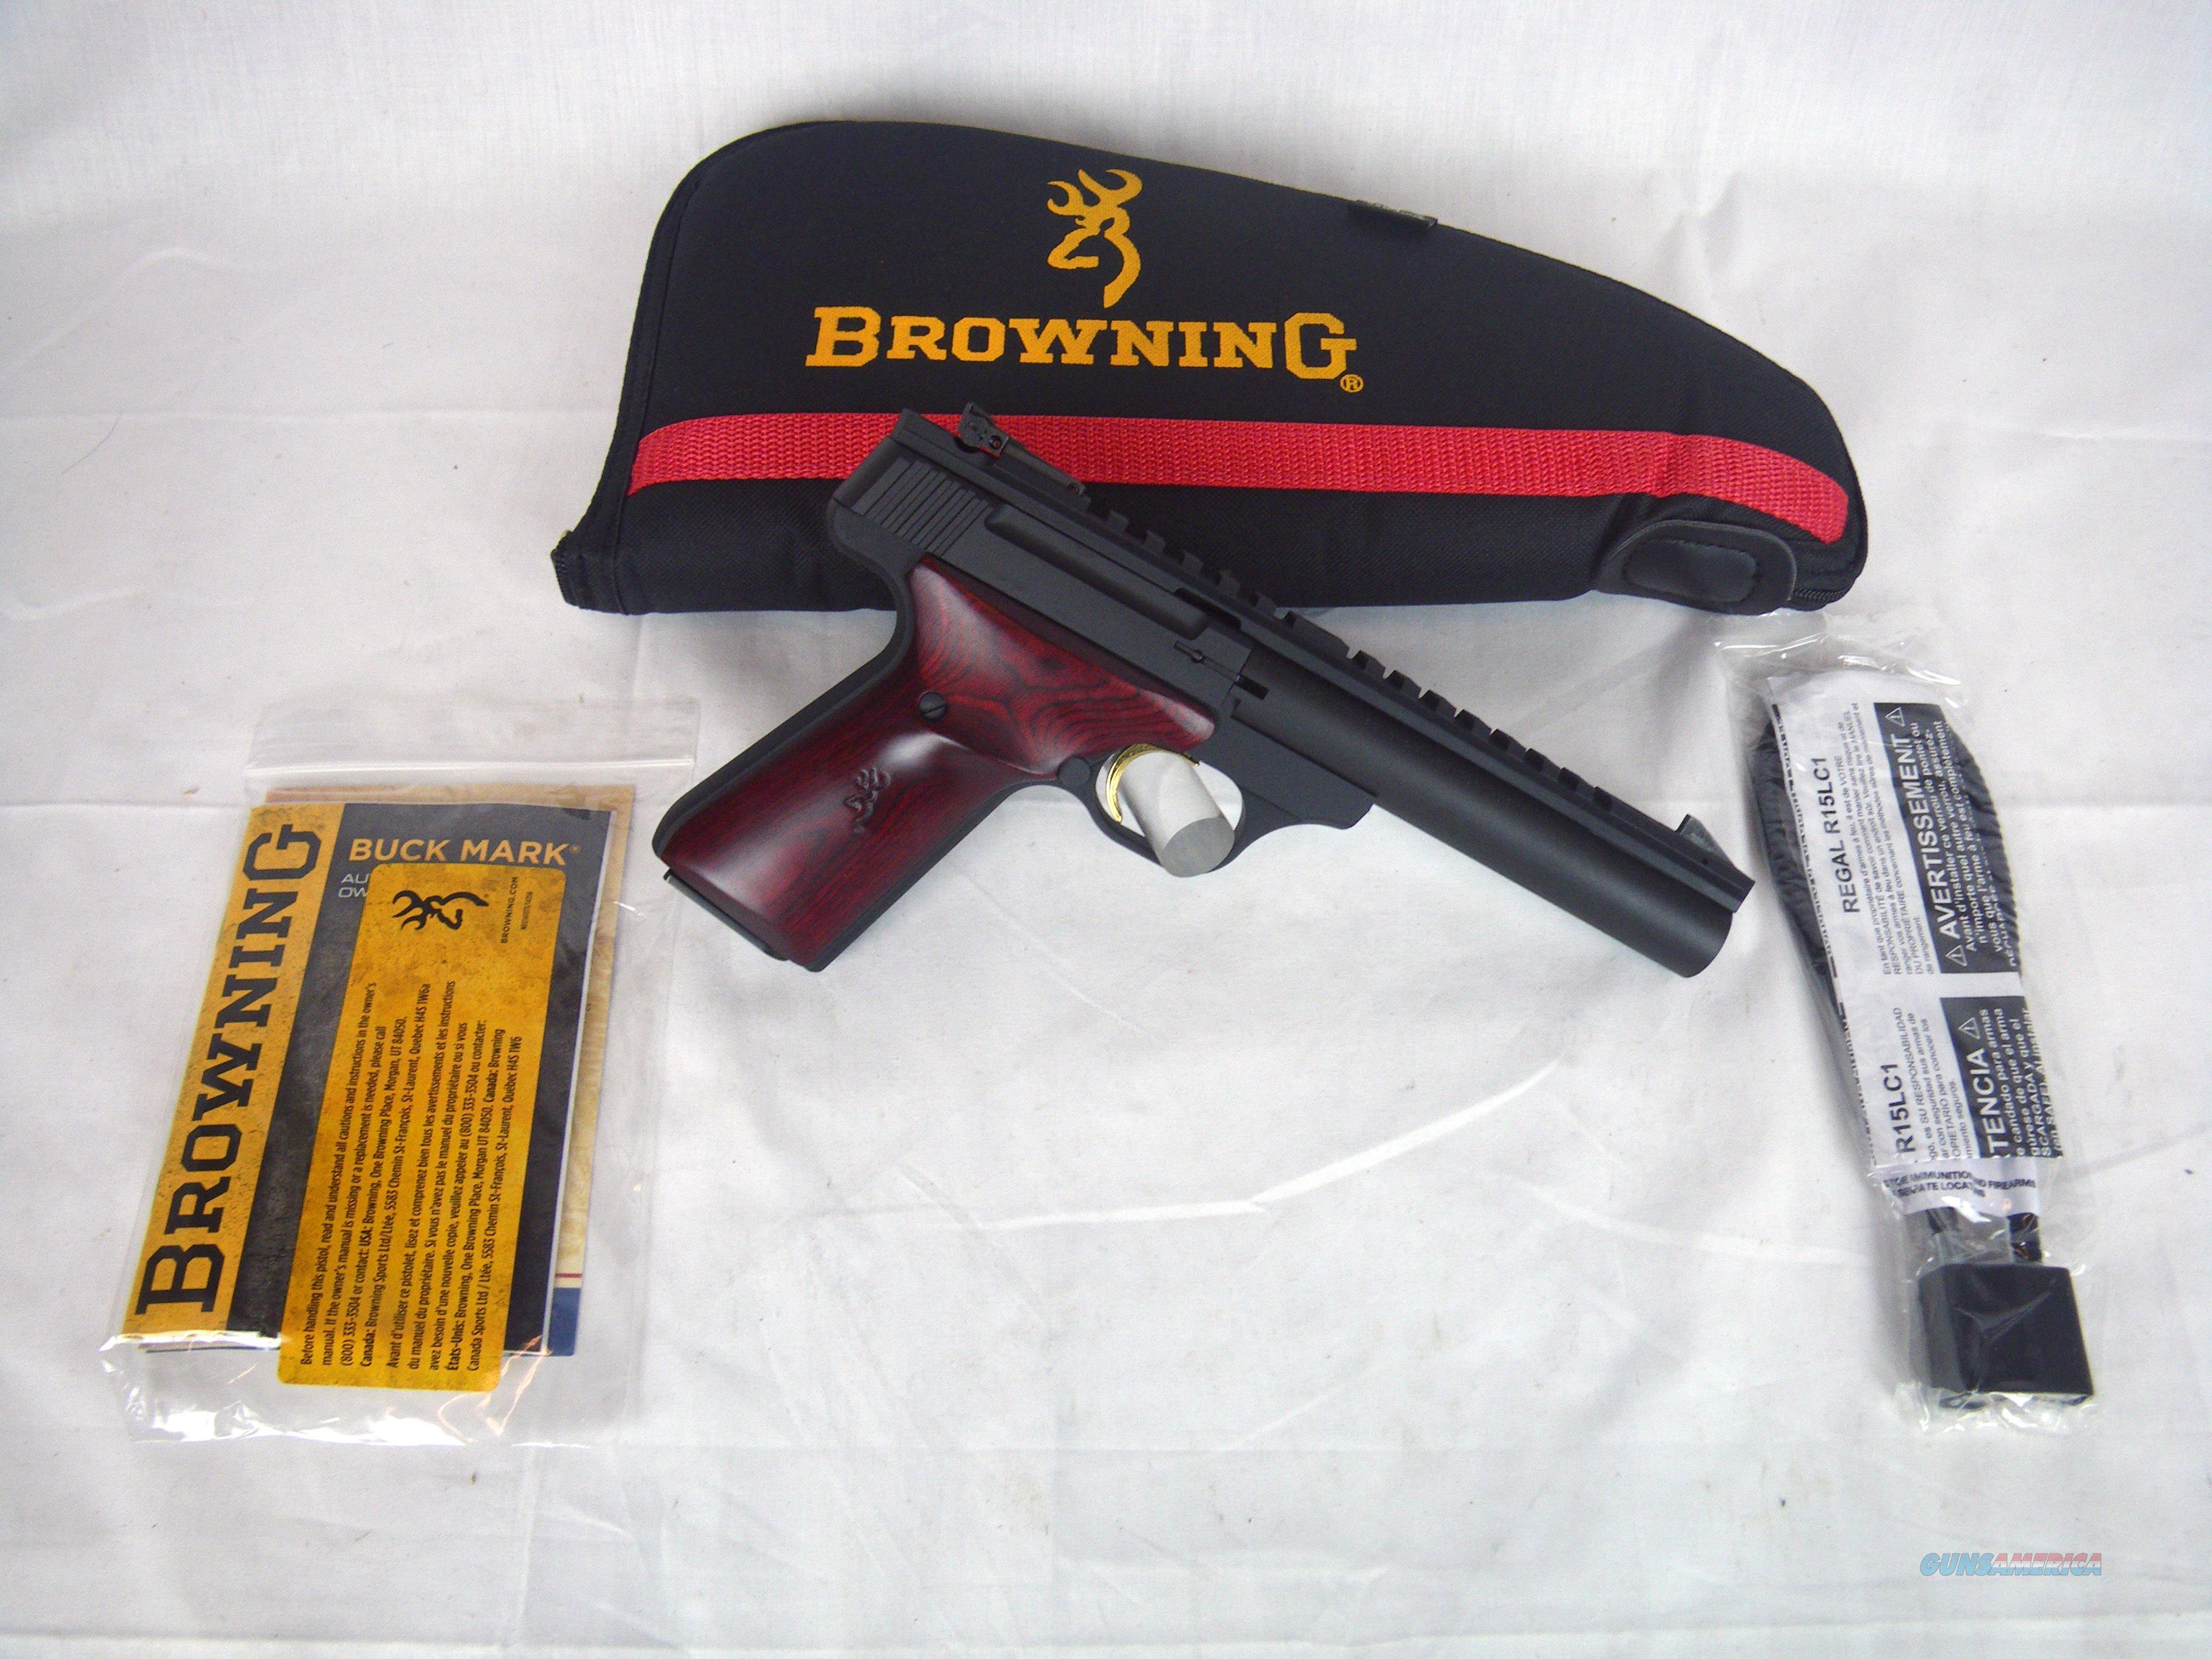 "Browning Buckmark Field Target 22lr 5.5"" Bull NEW #051528490  Guns > Pistols > Browning Pistols > Buckmark"